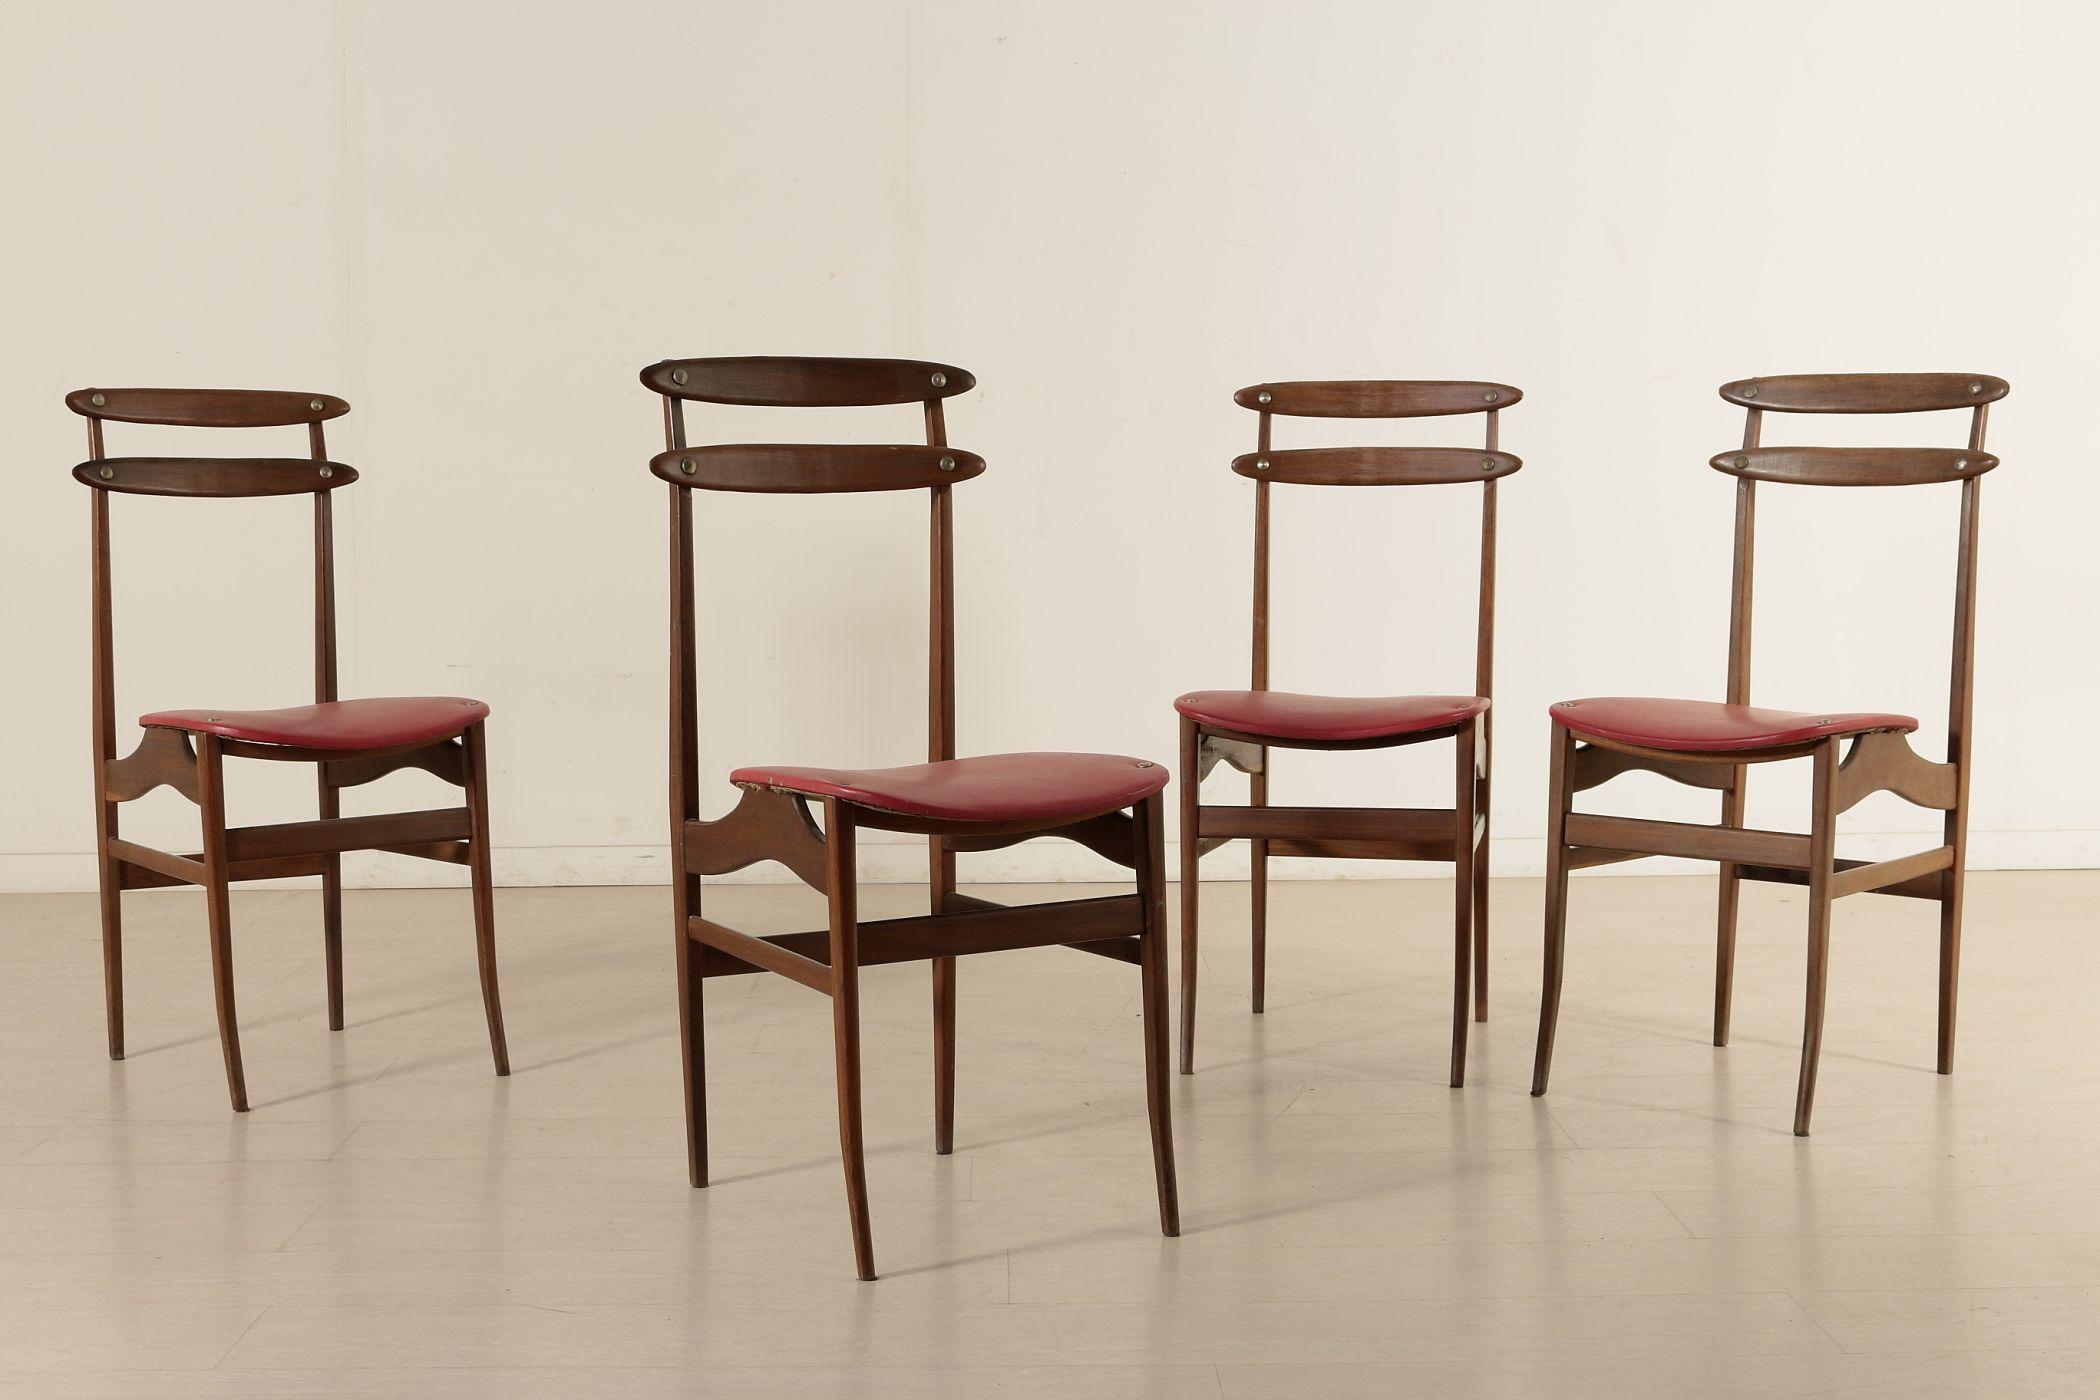 Mobili Scandinavi Modernariato : Sedie anni anticonline mobilio arredamento midcenturymodern